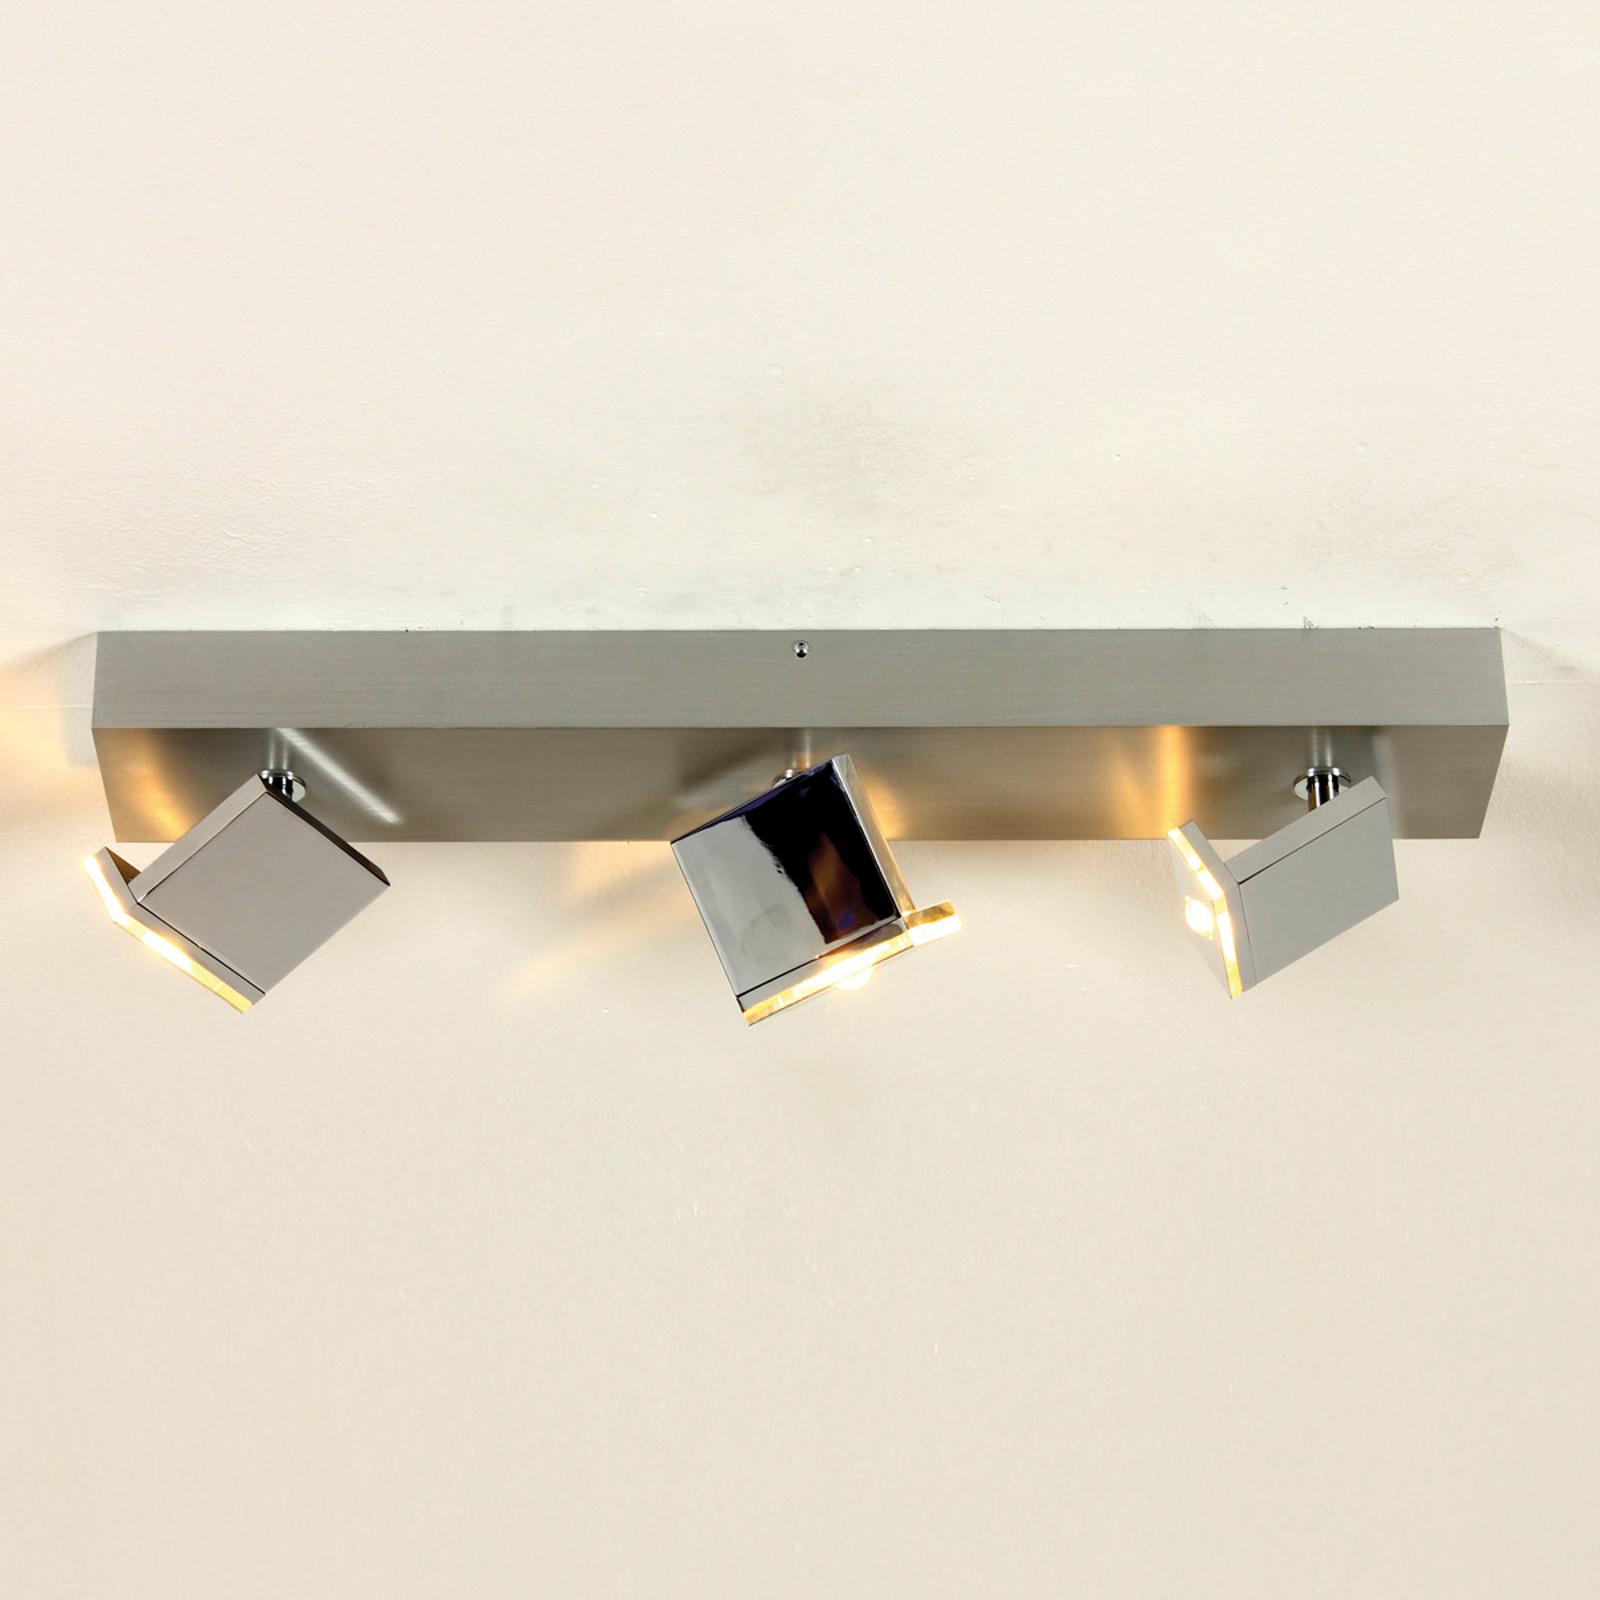 Plafoniera LED Elle a 3 punti luce, dimmerabile